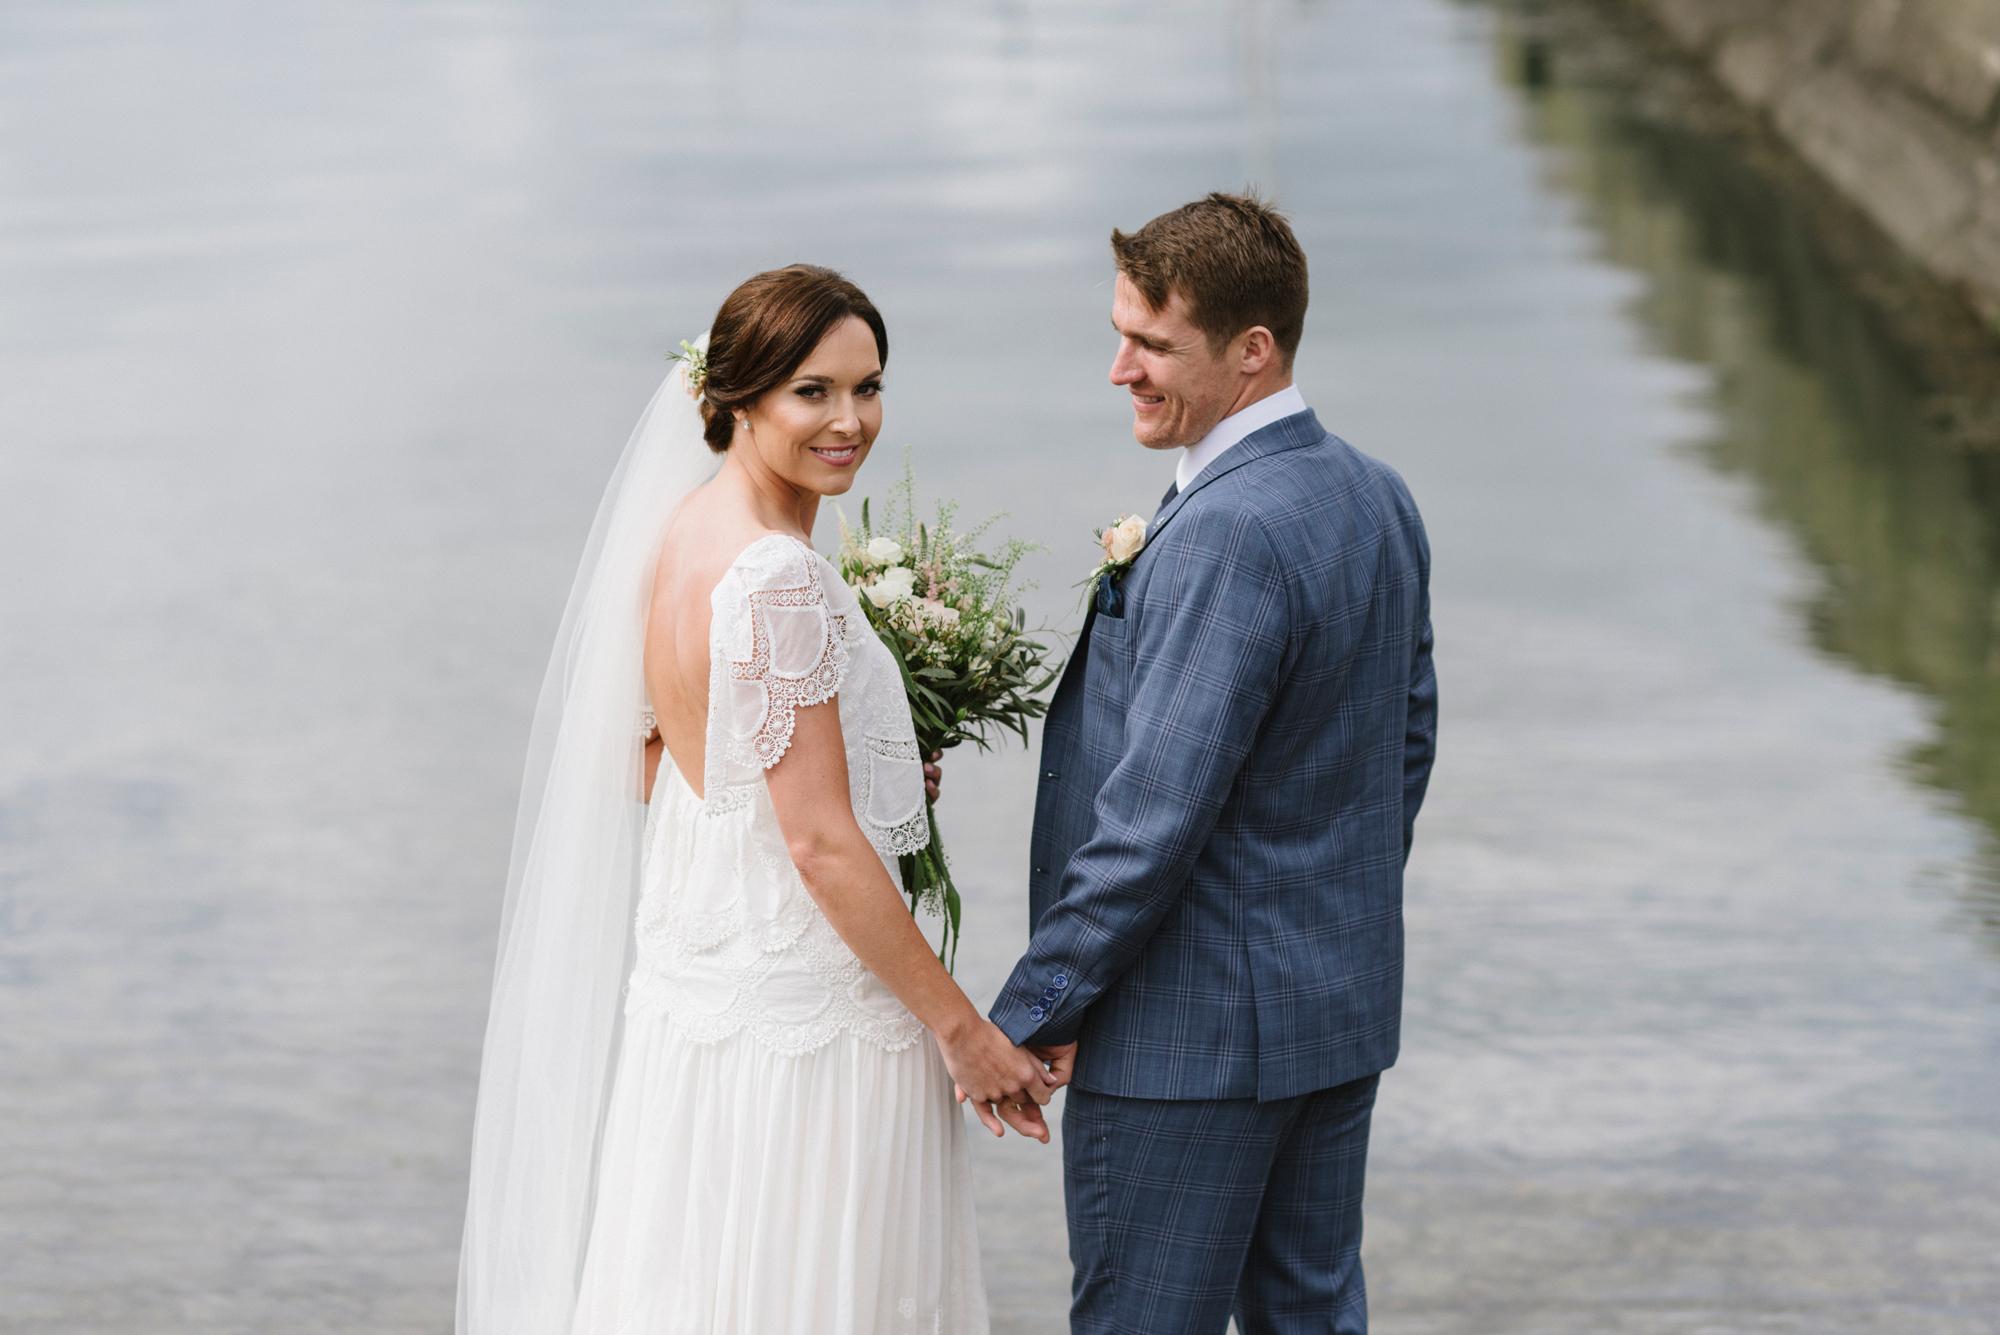 ghan_house_Wedding_Sarah_Fyffe_wedding_photographyer_9.jpg